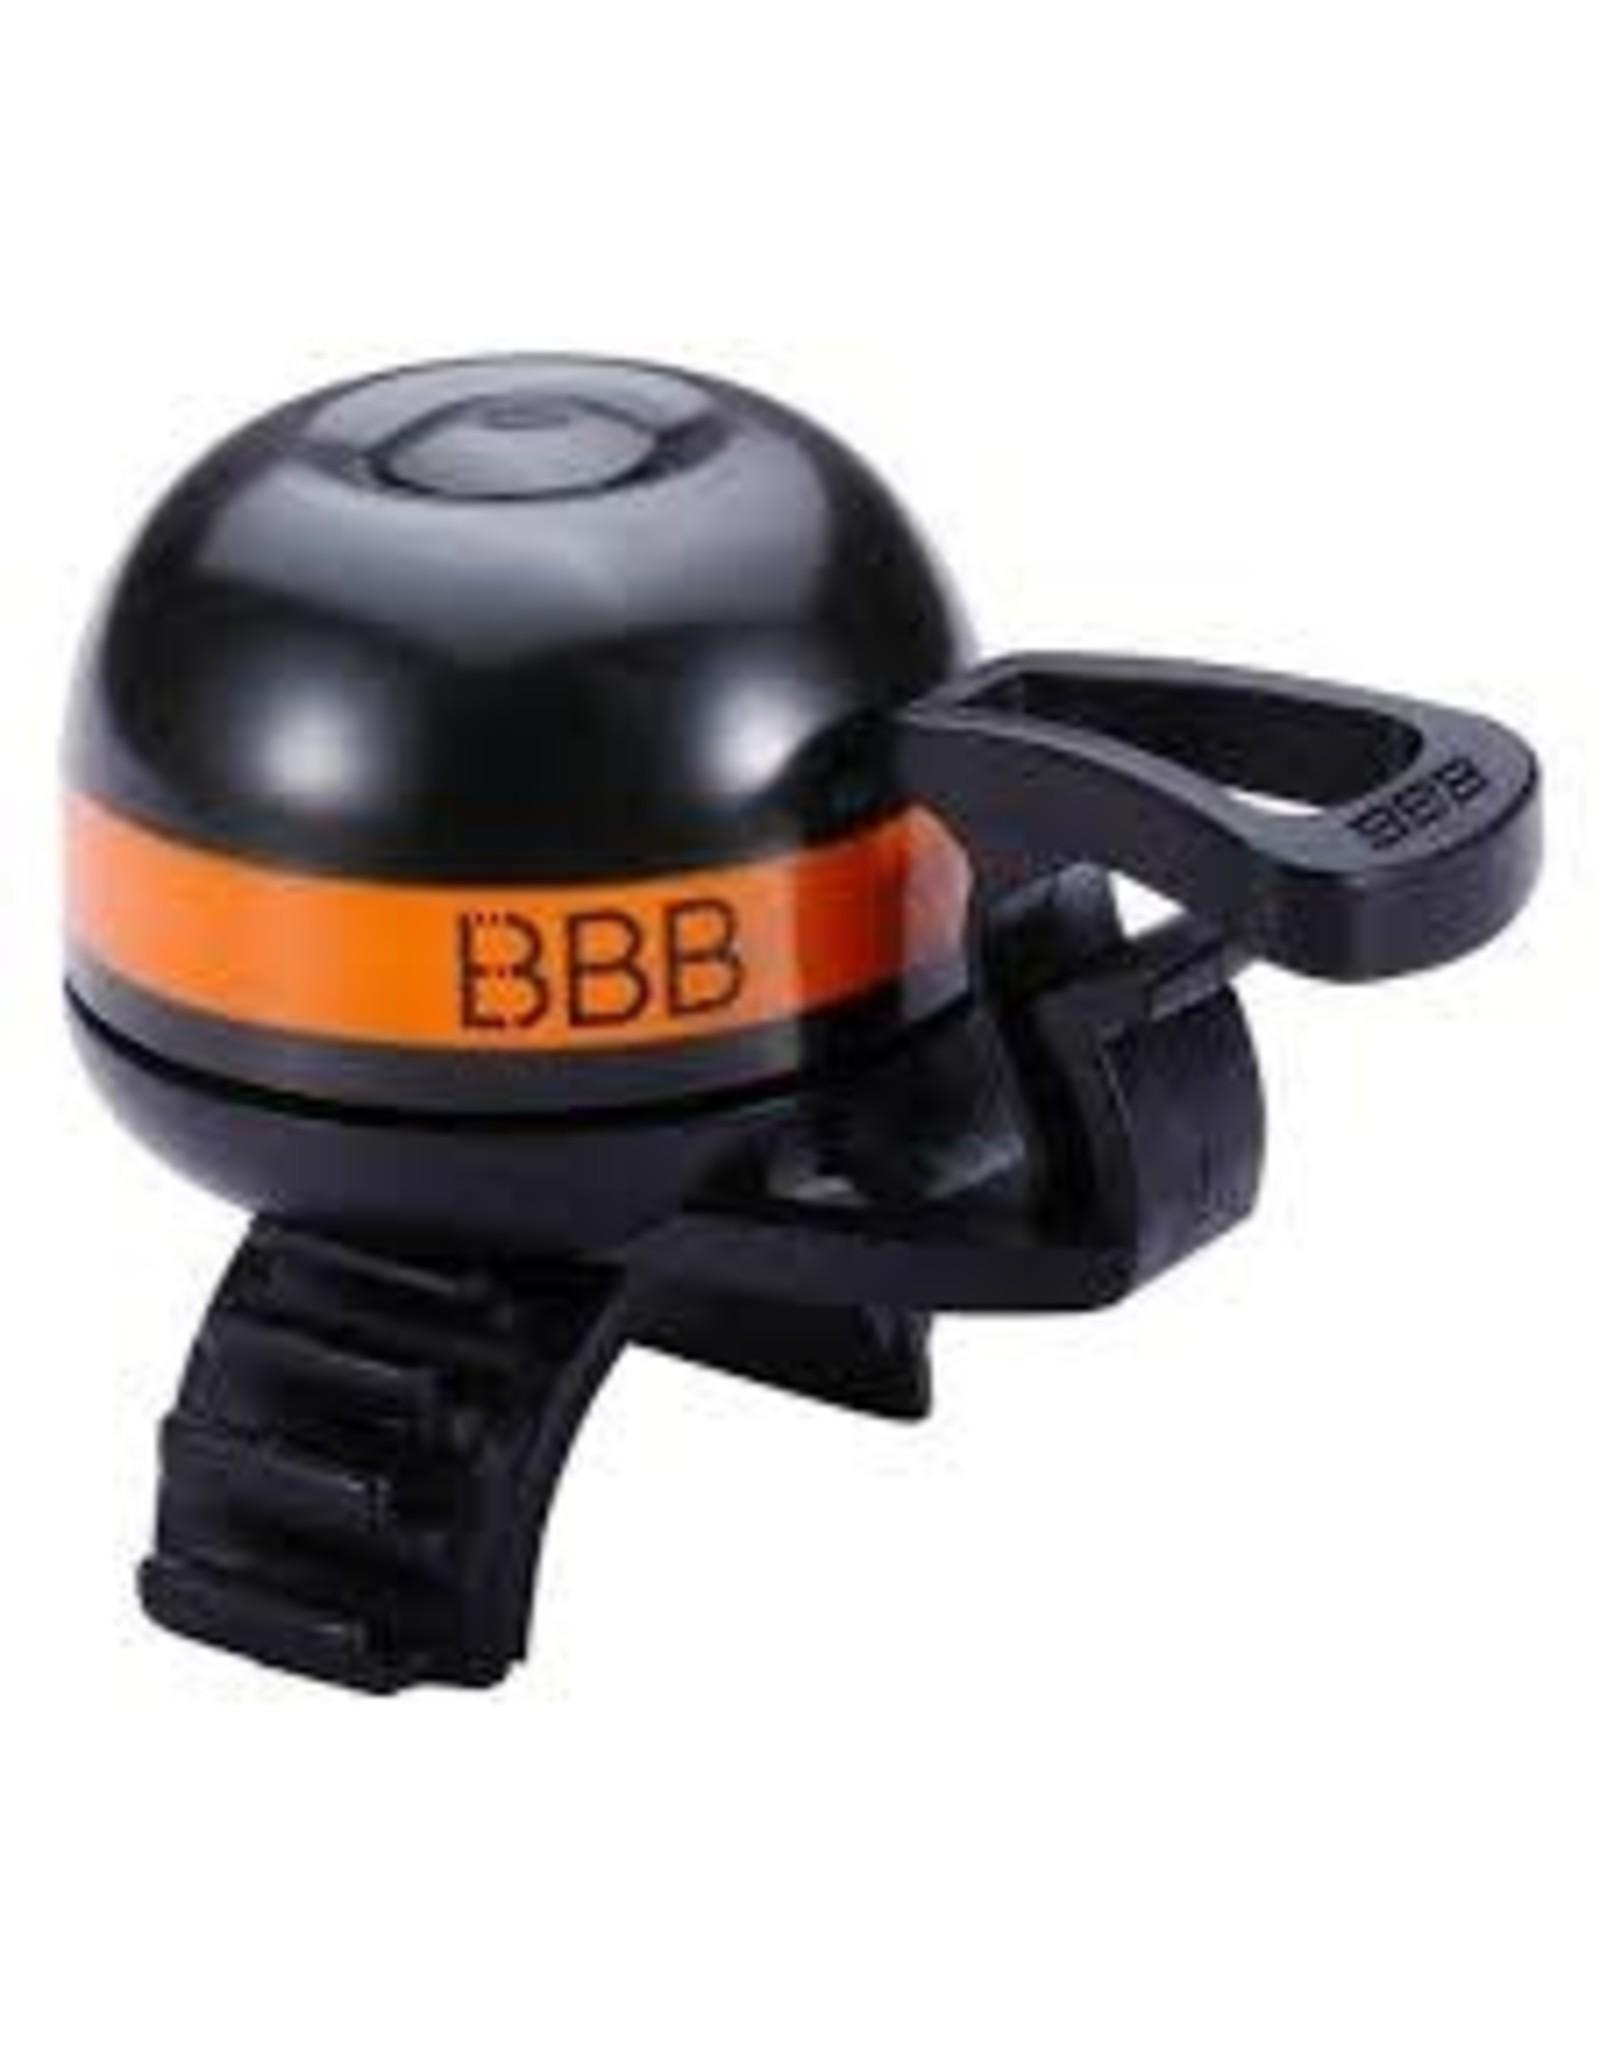 BBB EASYFIT BELL DELUXE ORANGE